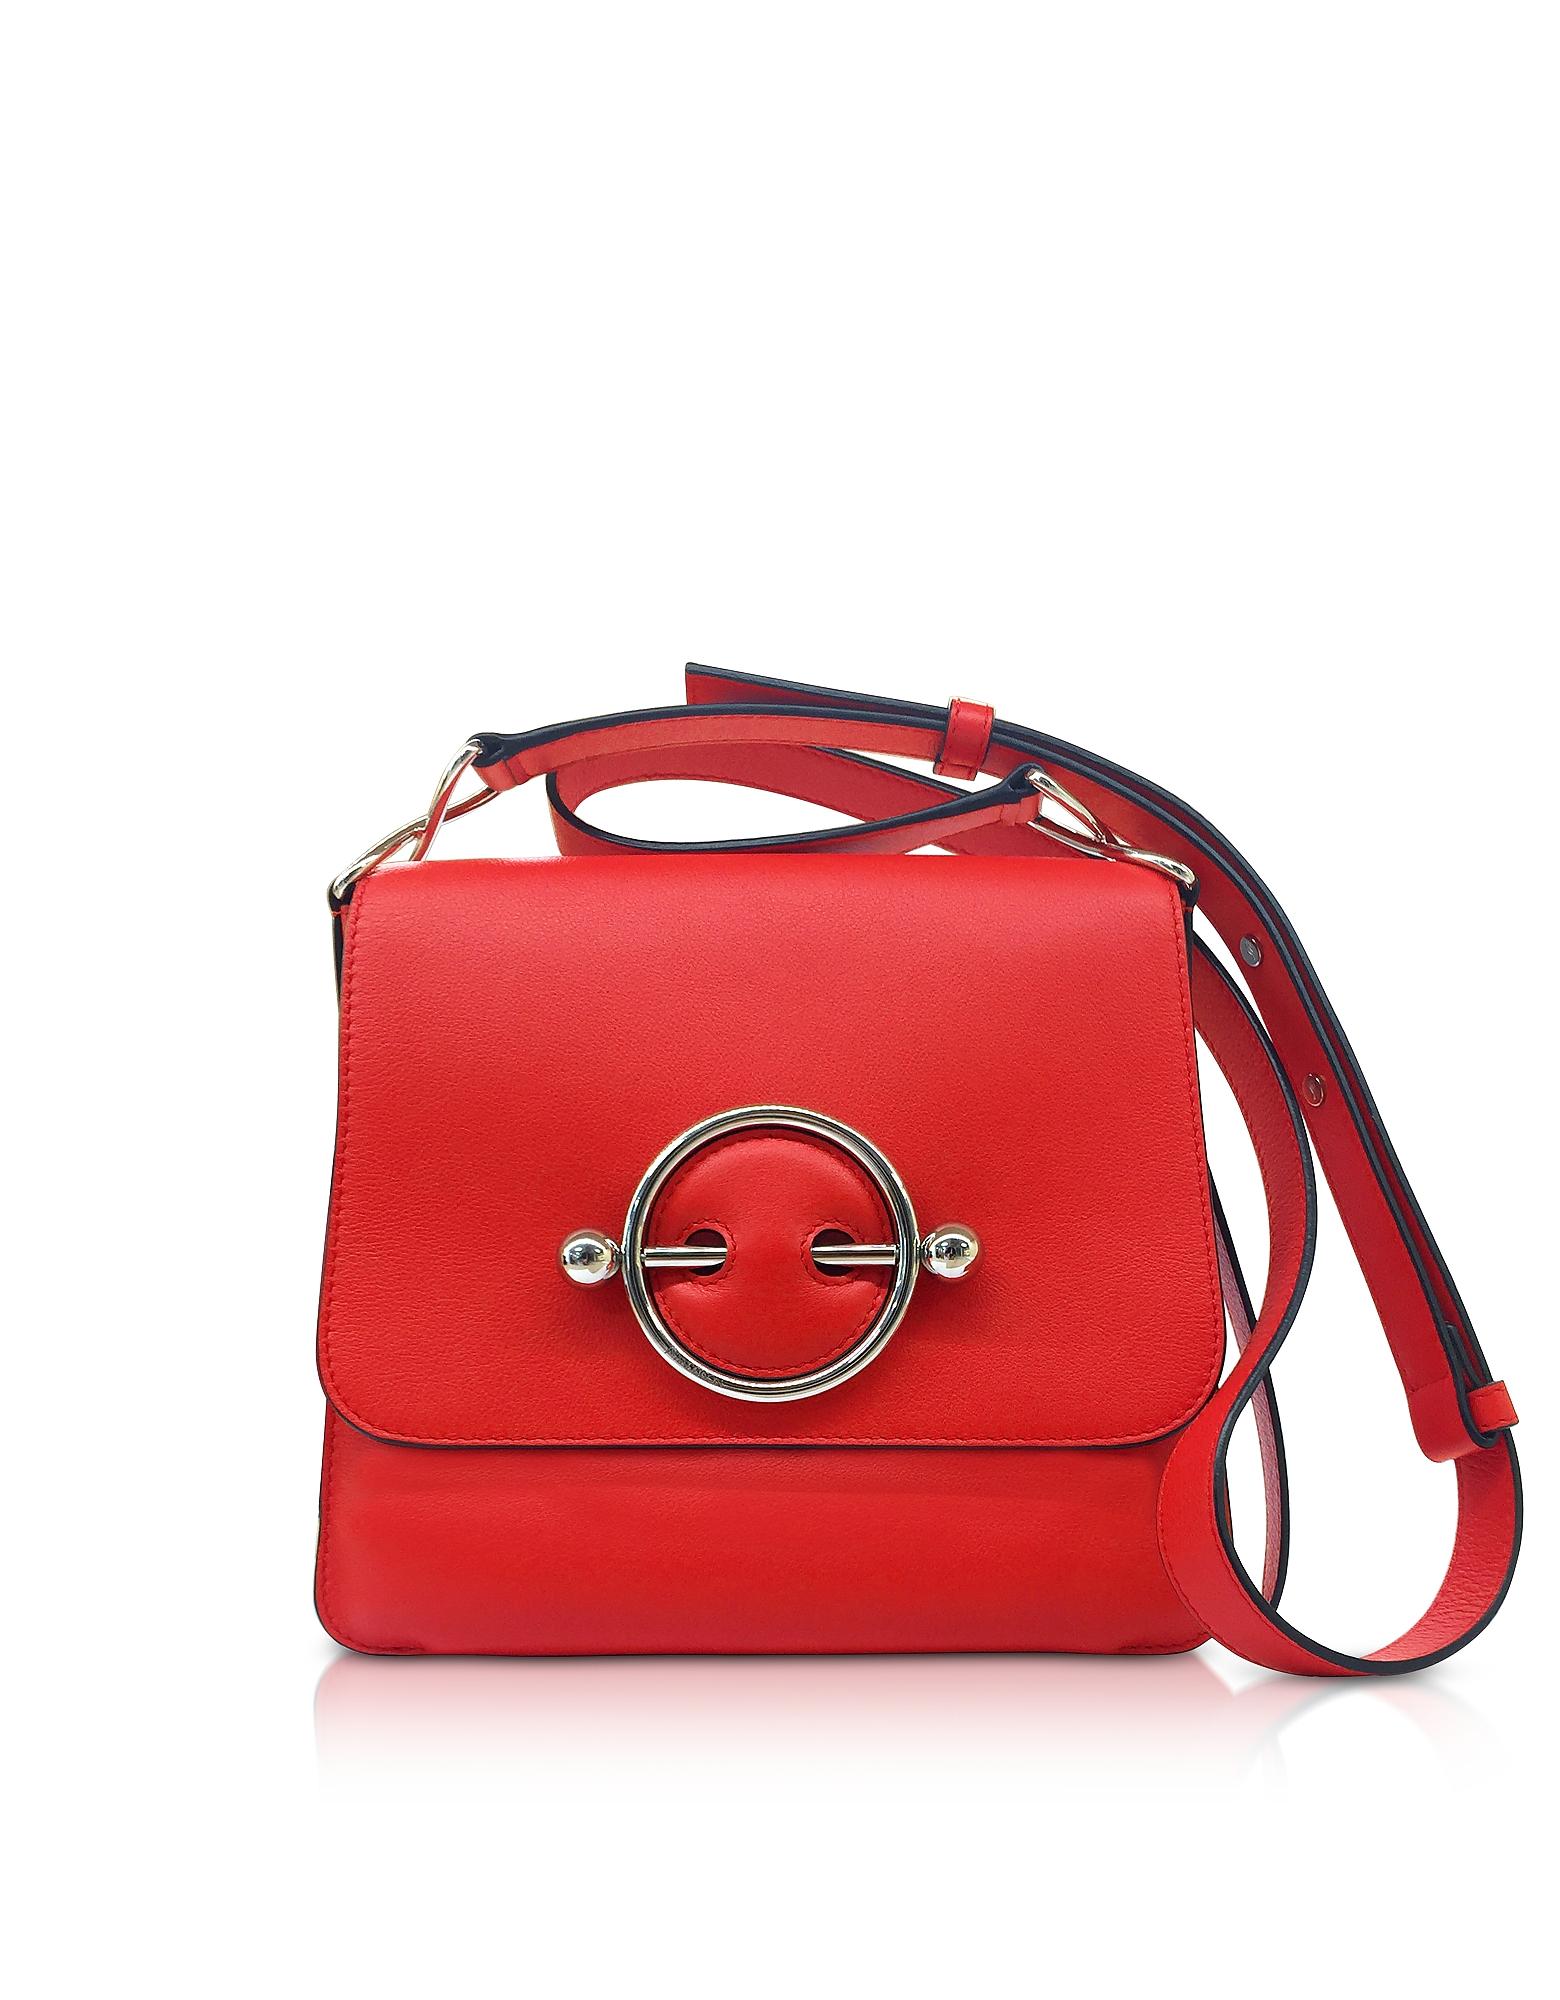 JW Anderson Handbags, Smooth Leather Disc Bag